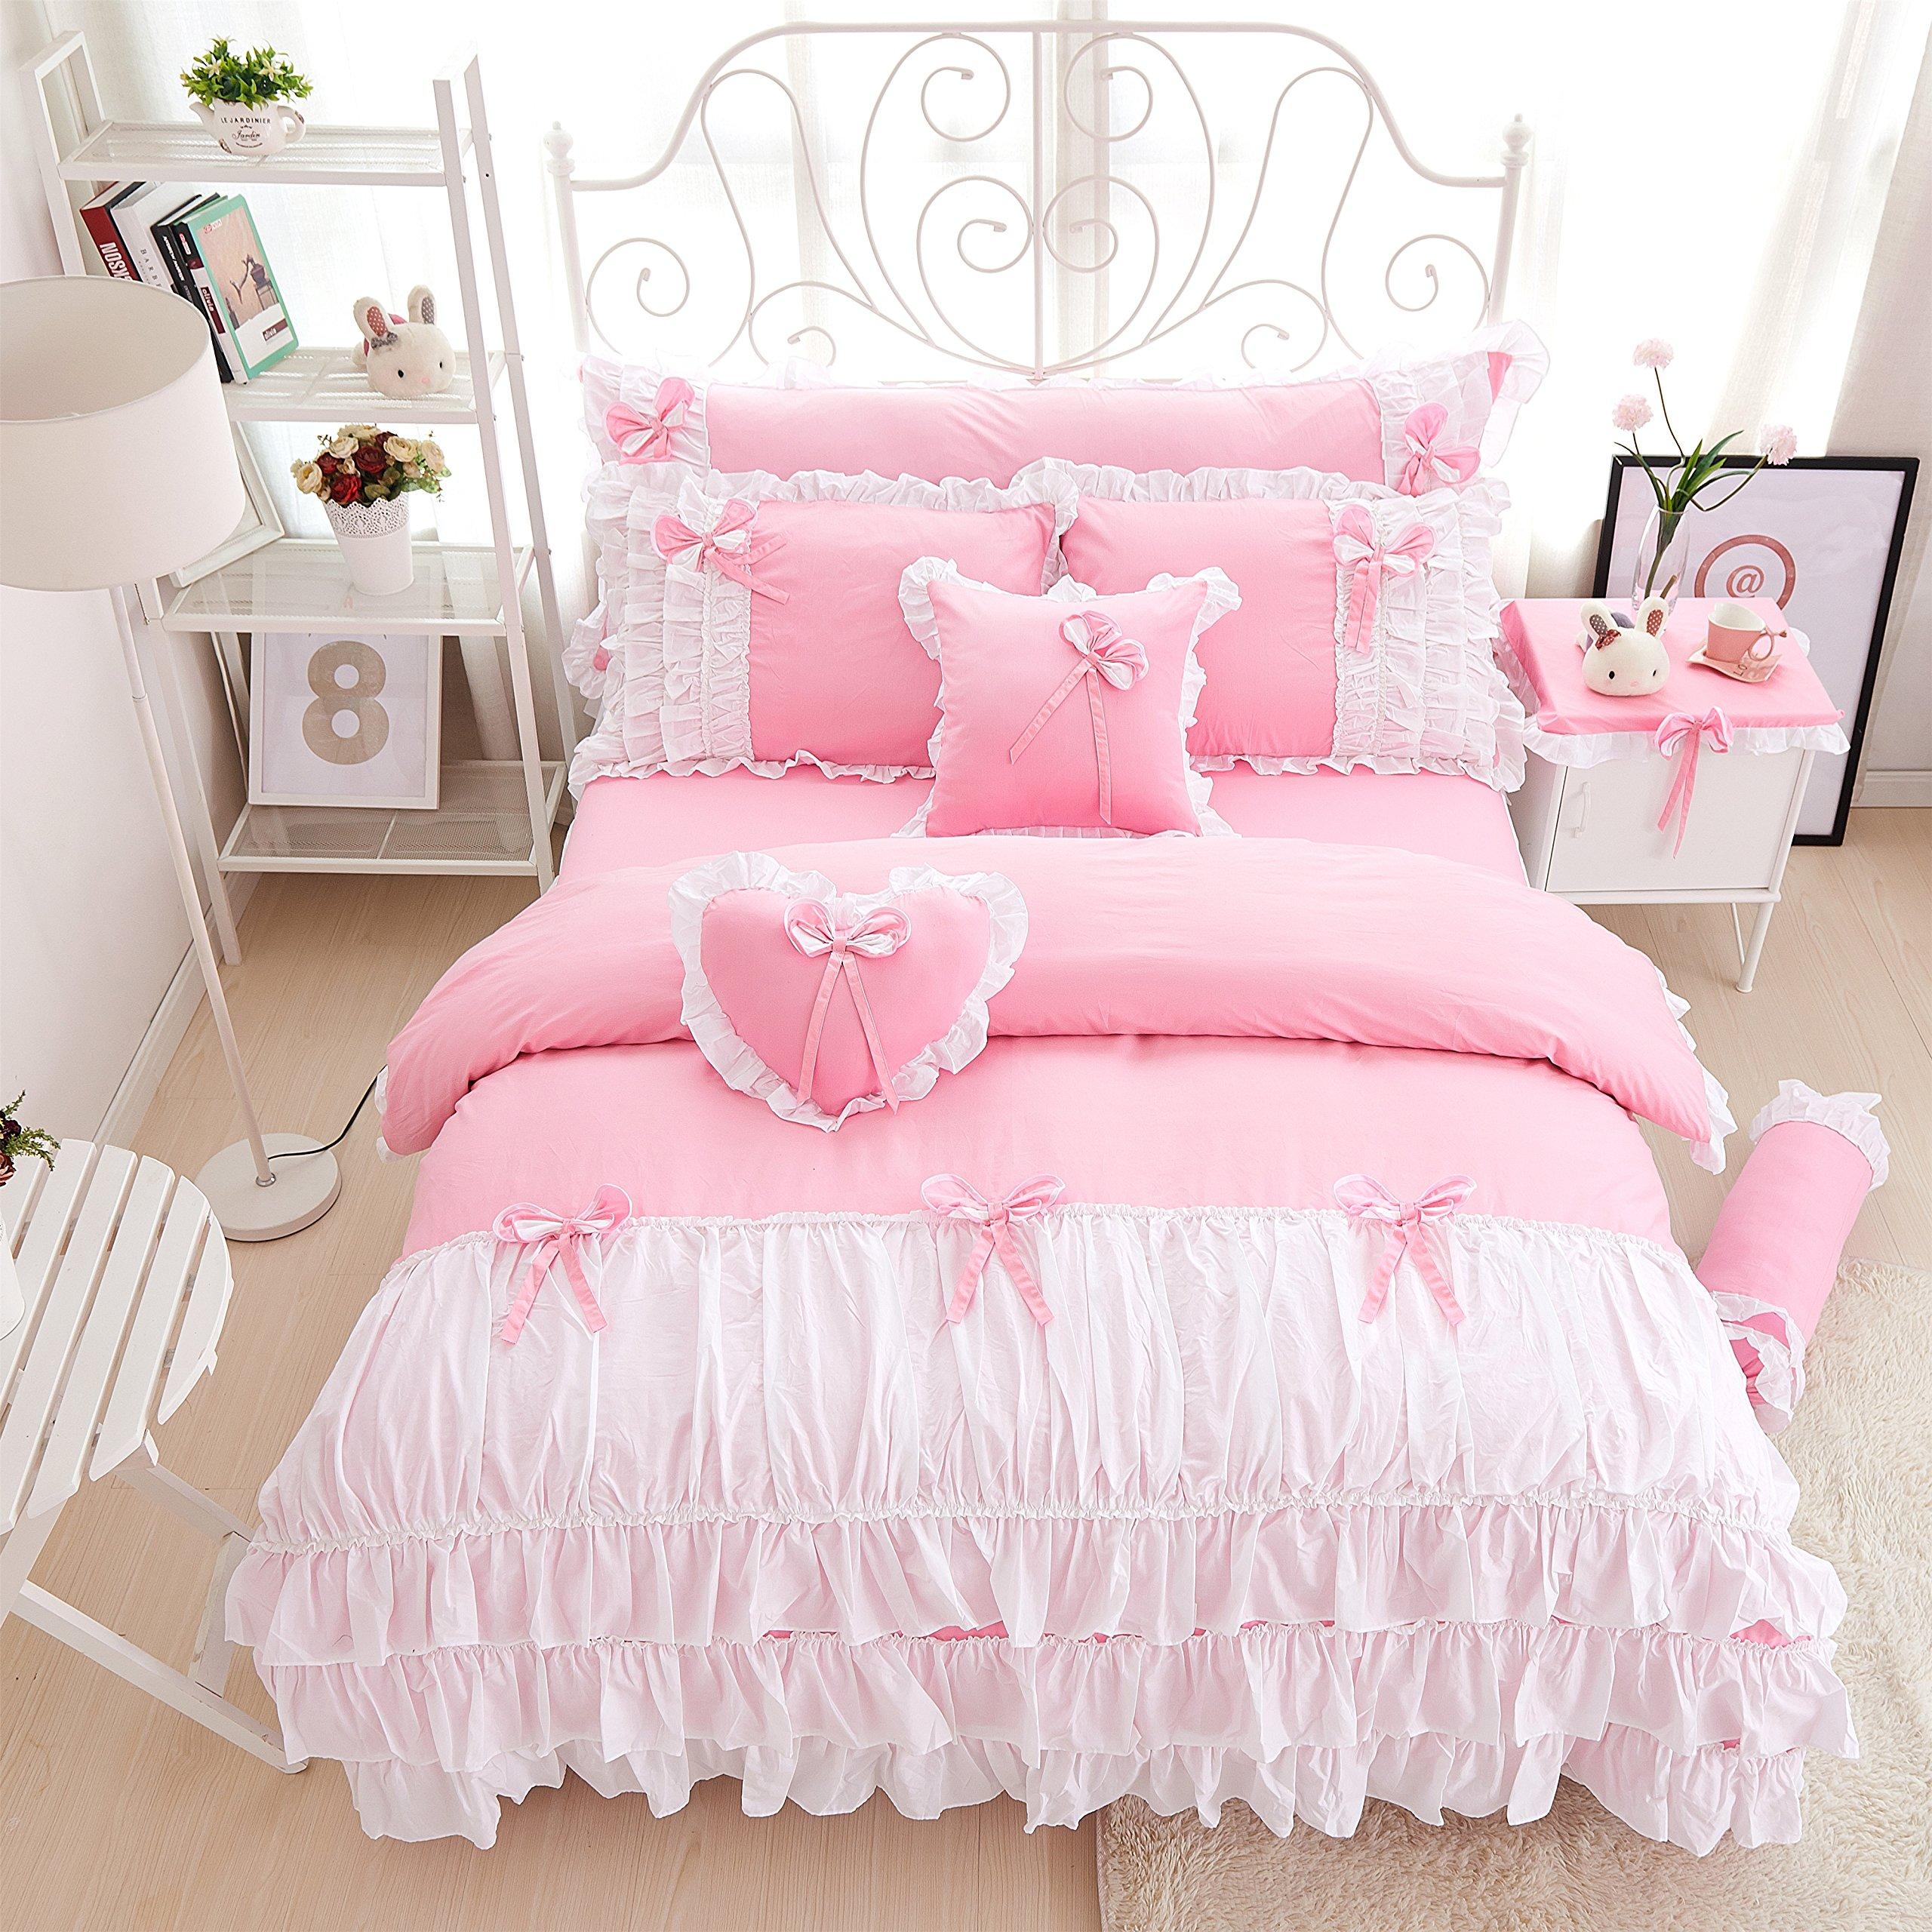 Lotus Karen Cute Candy Color Ruffles Korean Bedding Set Bow-knots 100%Cotton 4PC Pink Girls Duvet Cover Sets,1Duvet Cover,1Bedskirt,2Pillowcases,King Queen Full Twin Size